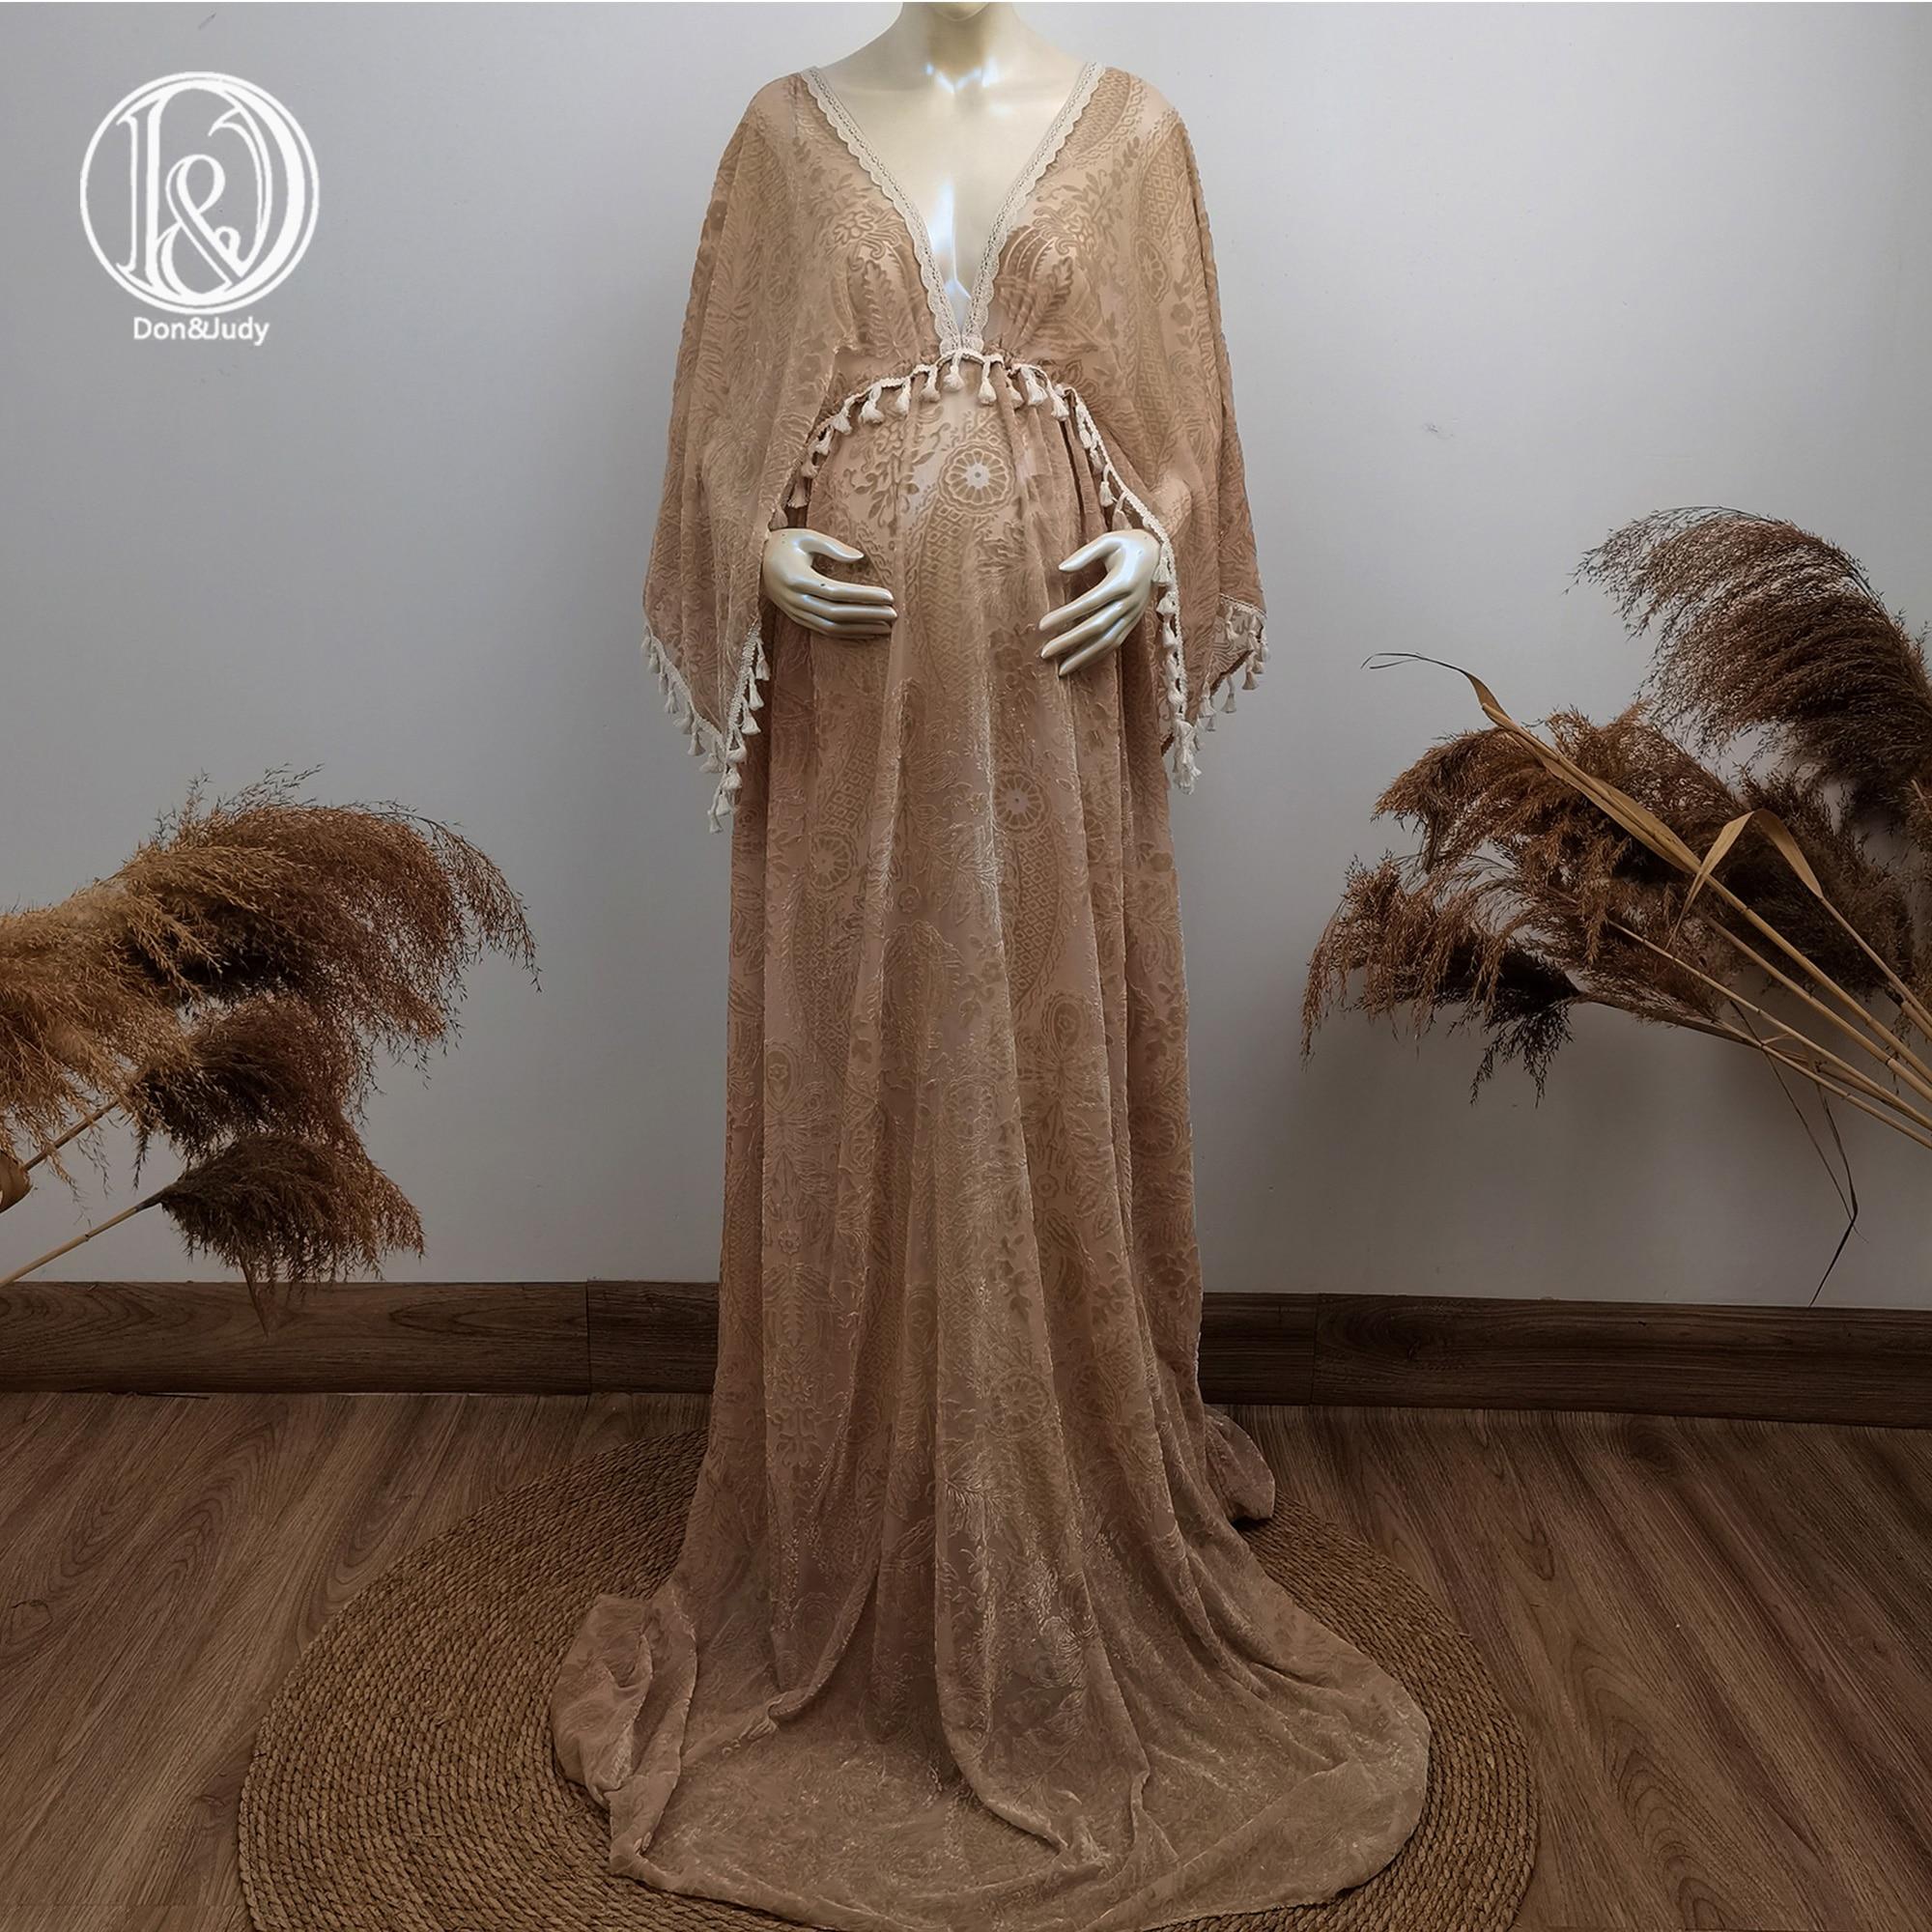 Don&Judy Khaki Maternity Dress For Photo Shoot V-neck Velvet Printing Pregnant Women Photography Party Prom Dress Baby Shower